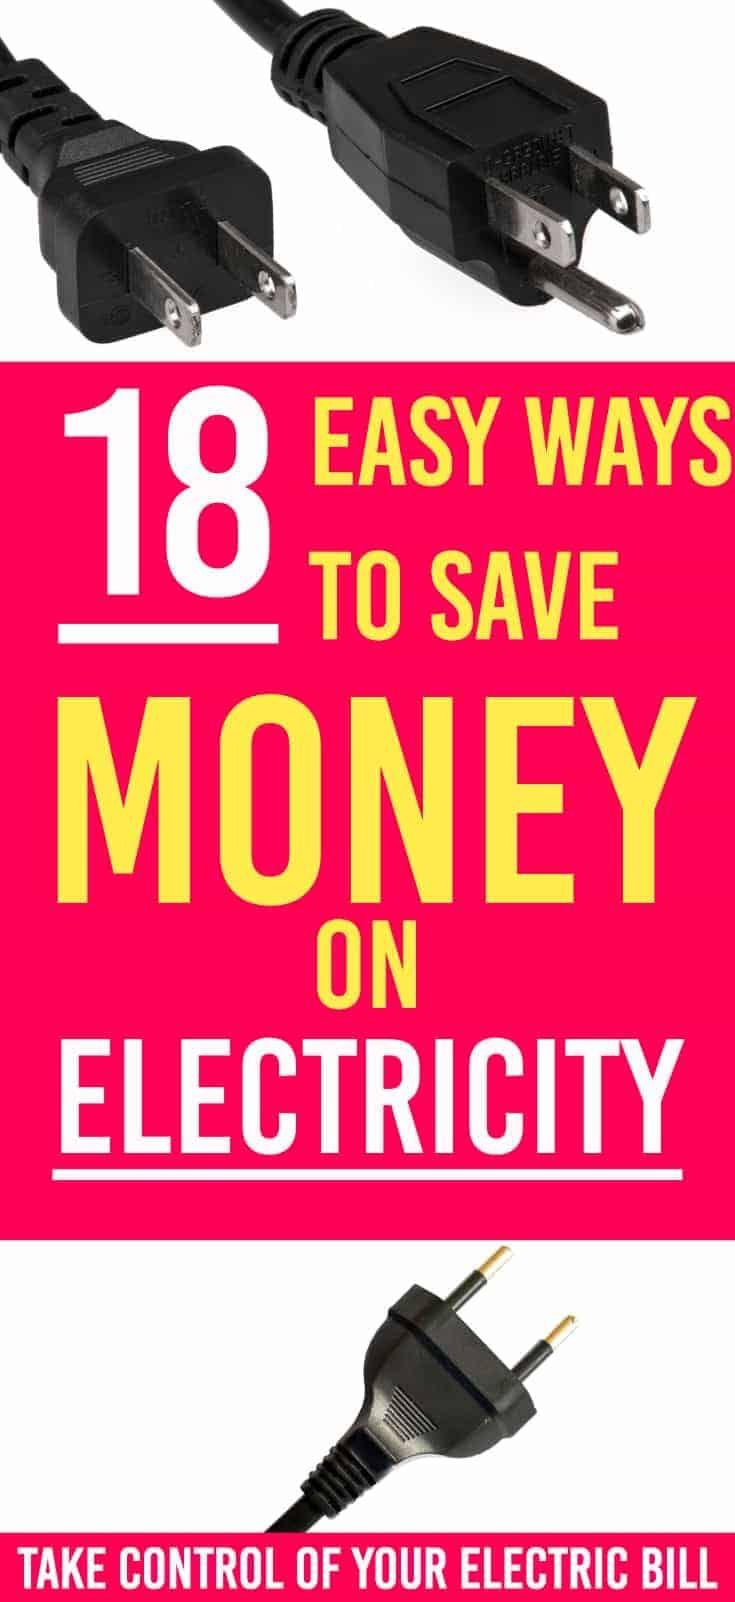 Pin On Top Money Saving Tips